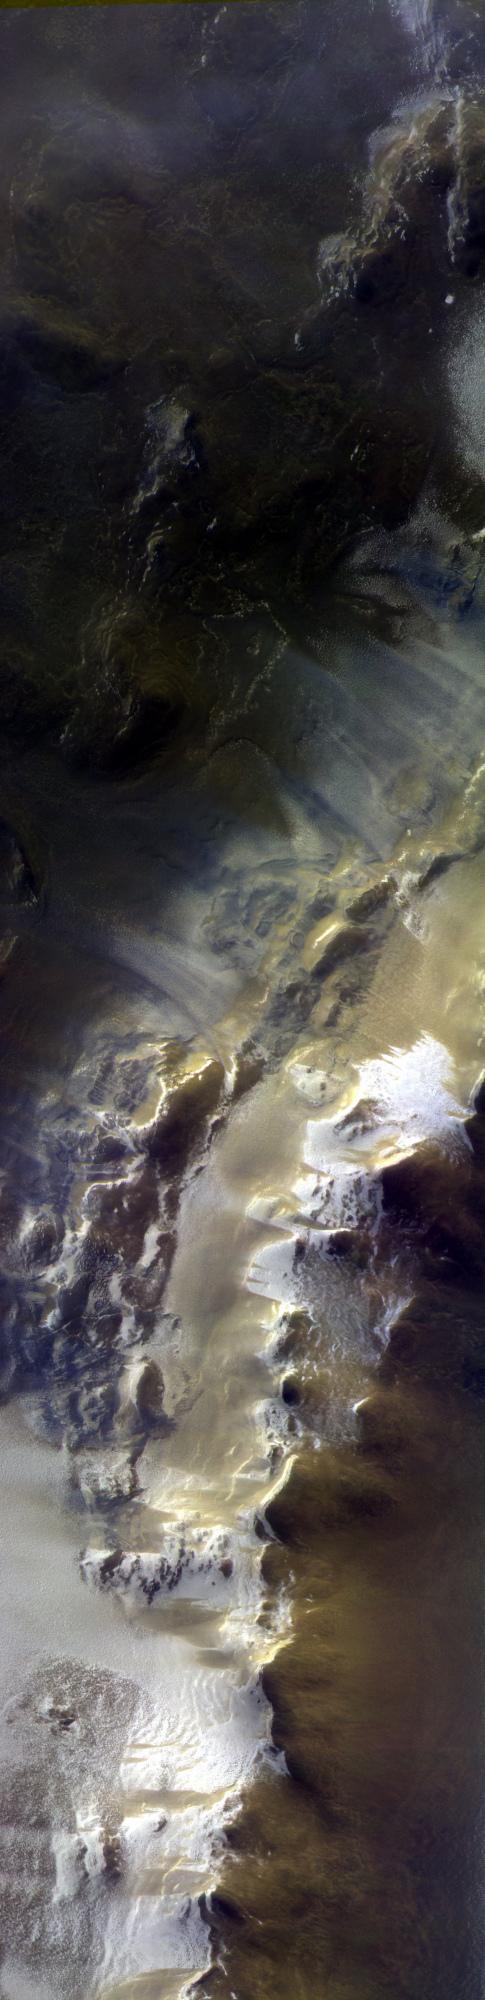 ExoMars_images_Korolev_Crater.jpg